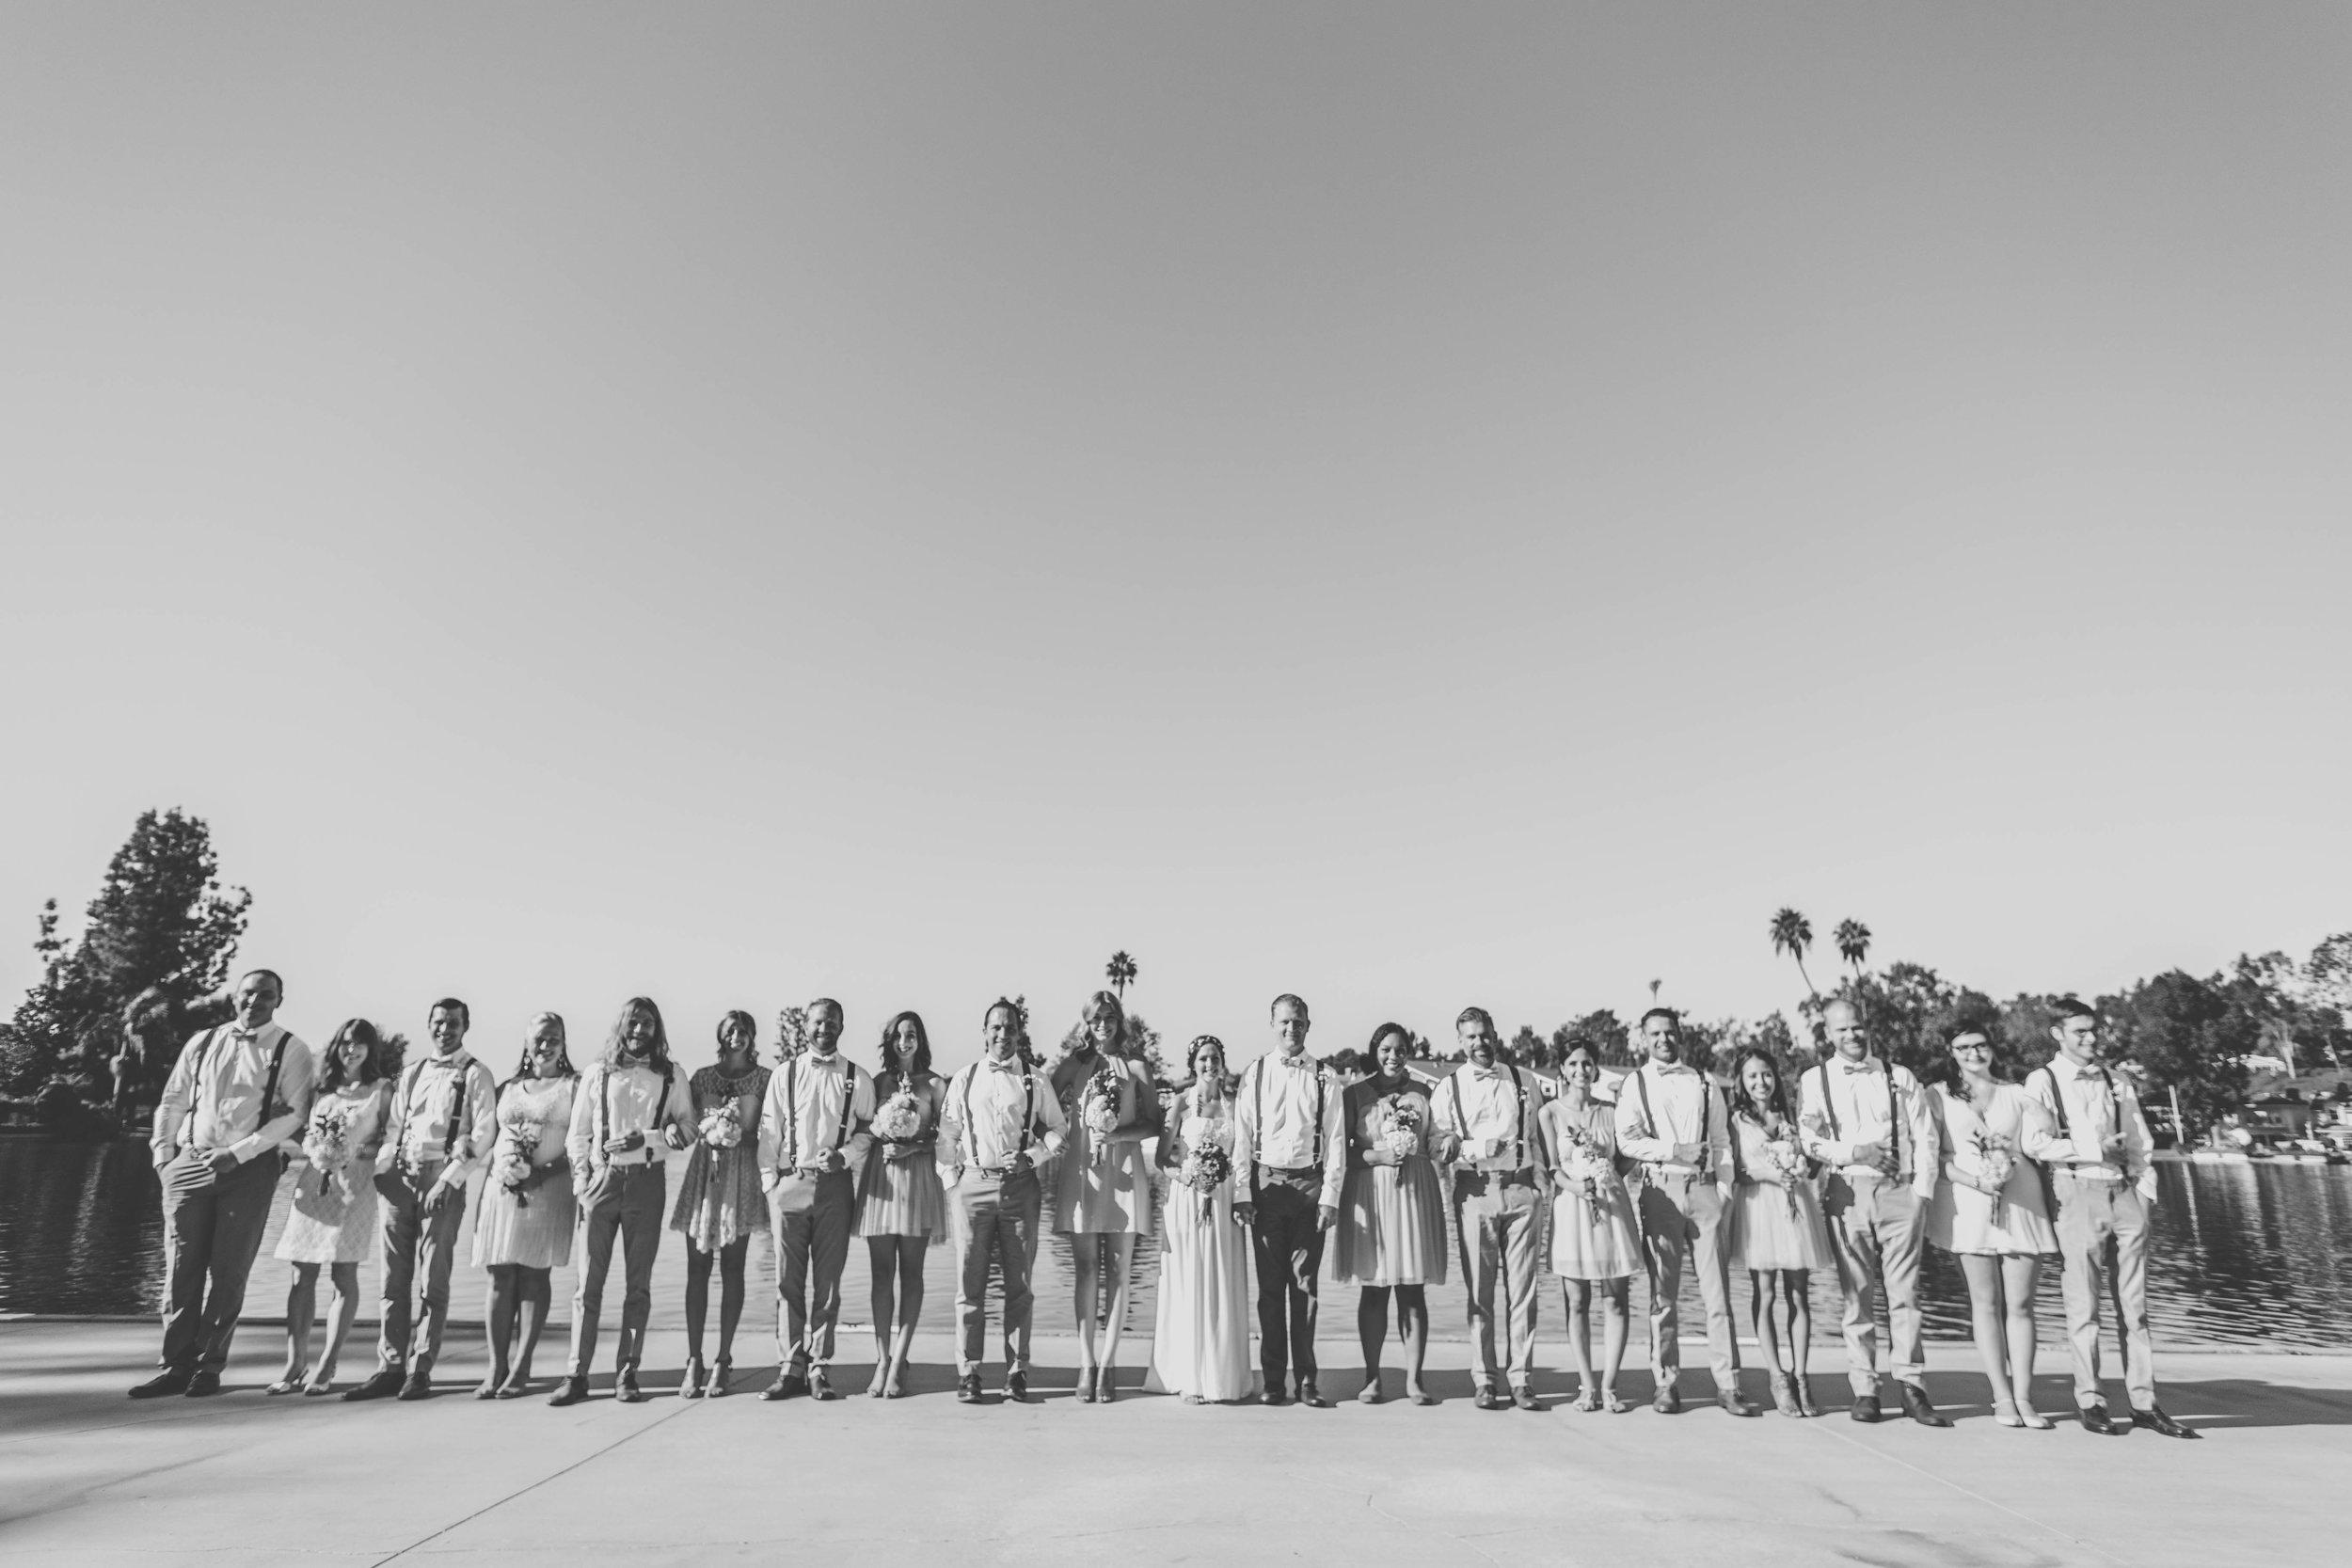 20141024-DePartee-Wedding-APavone-029-sm.jpg